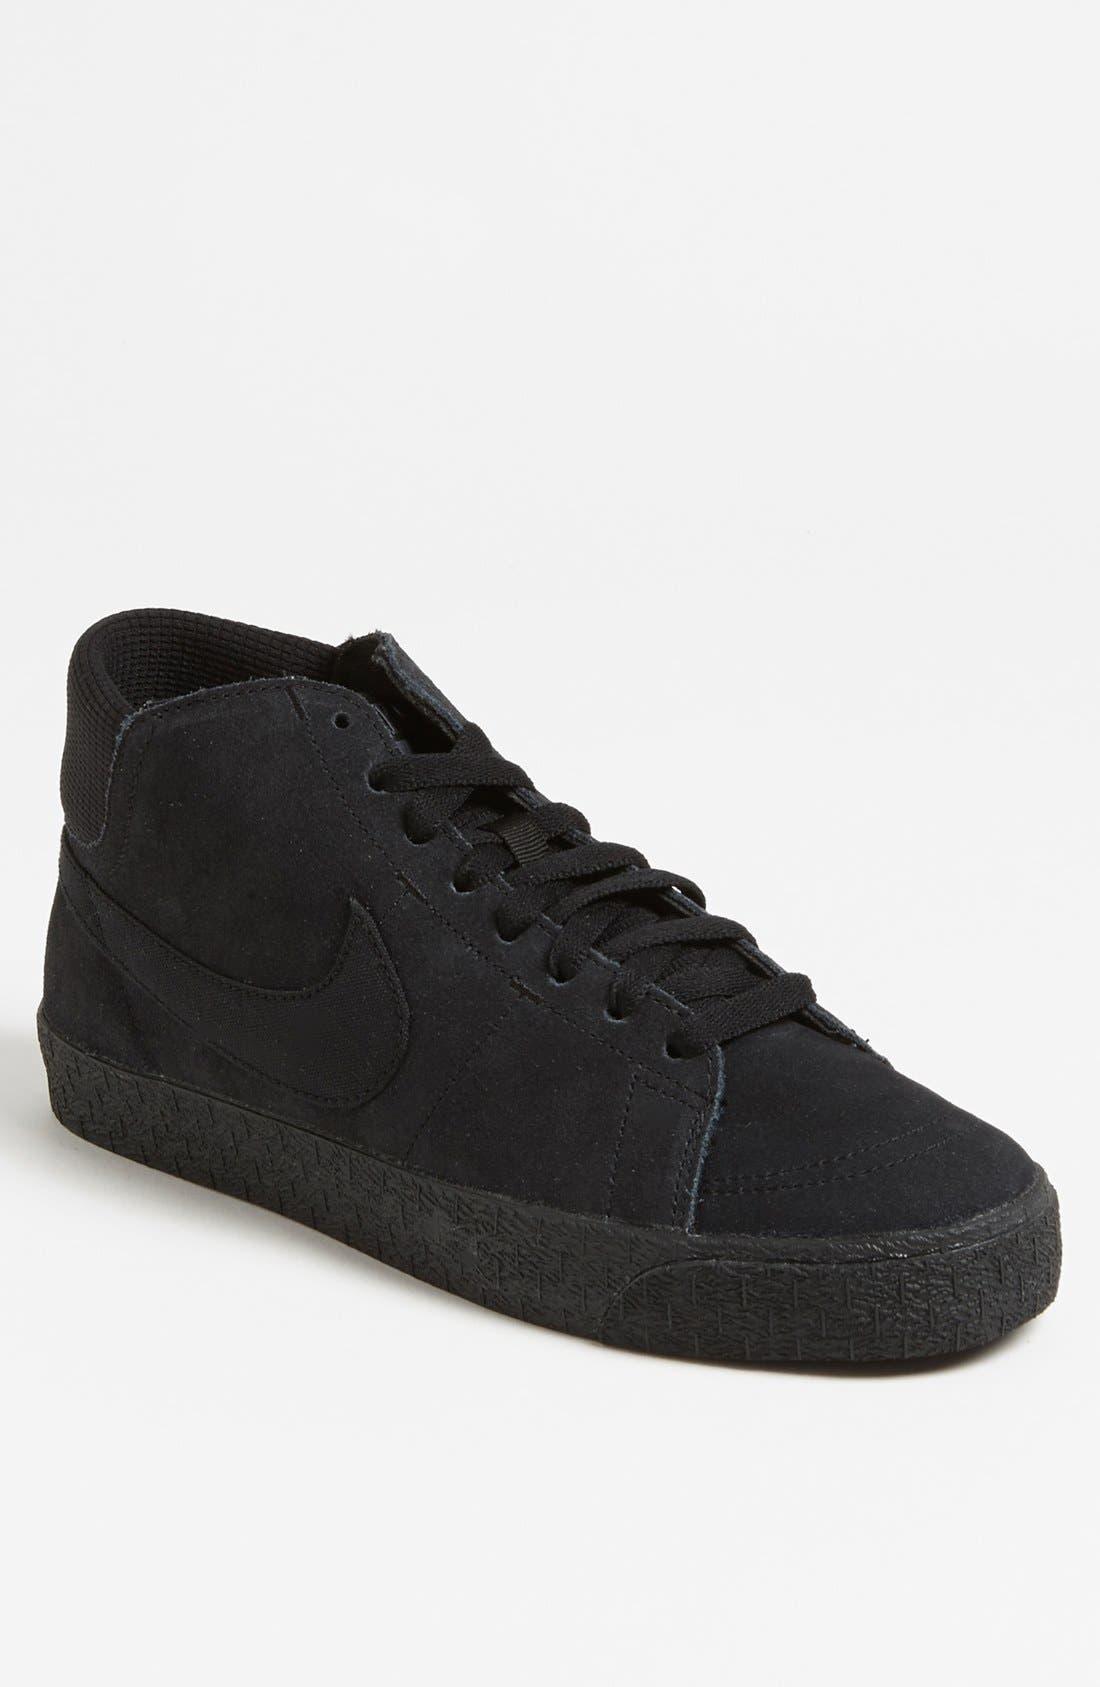 Alternate Image 1 Selected - Nike 'Blazer Mid LR' Skate Shoe (Men)